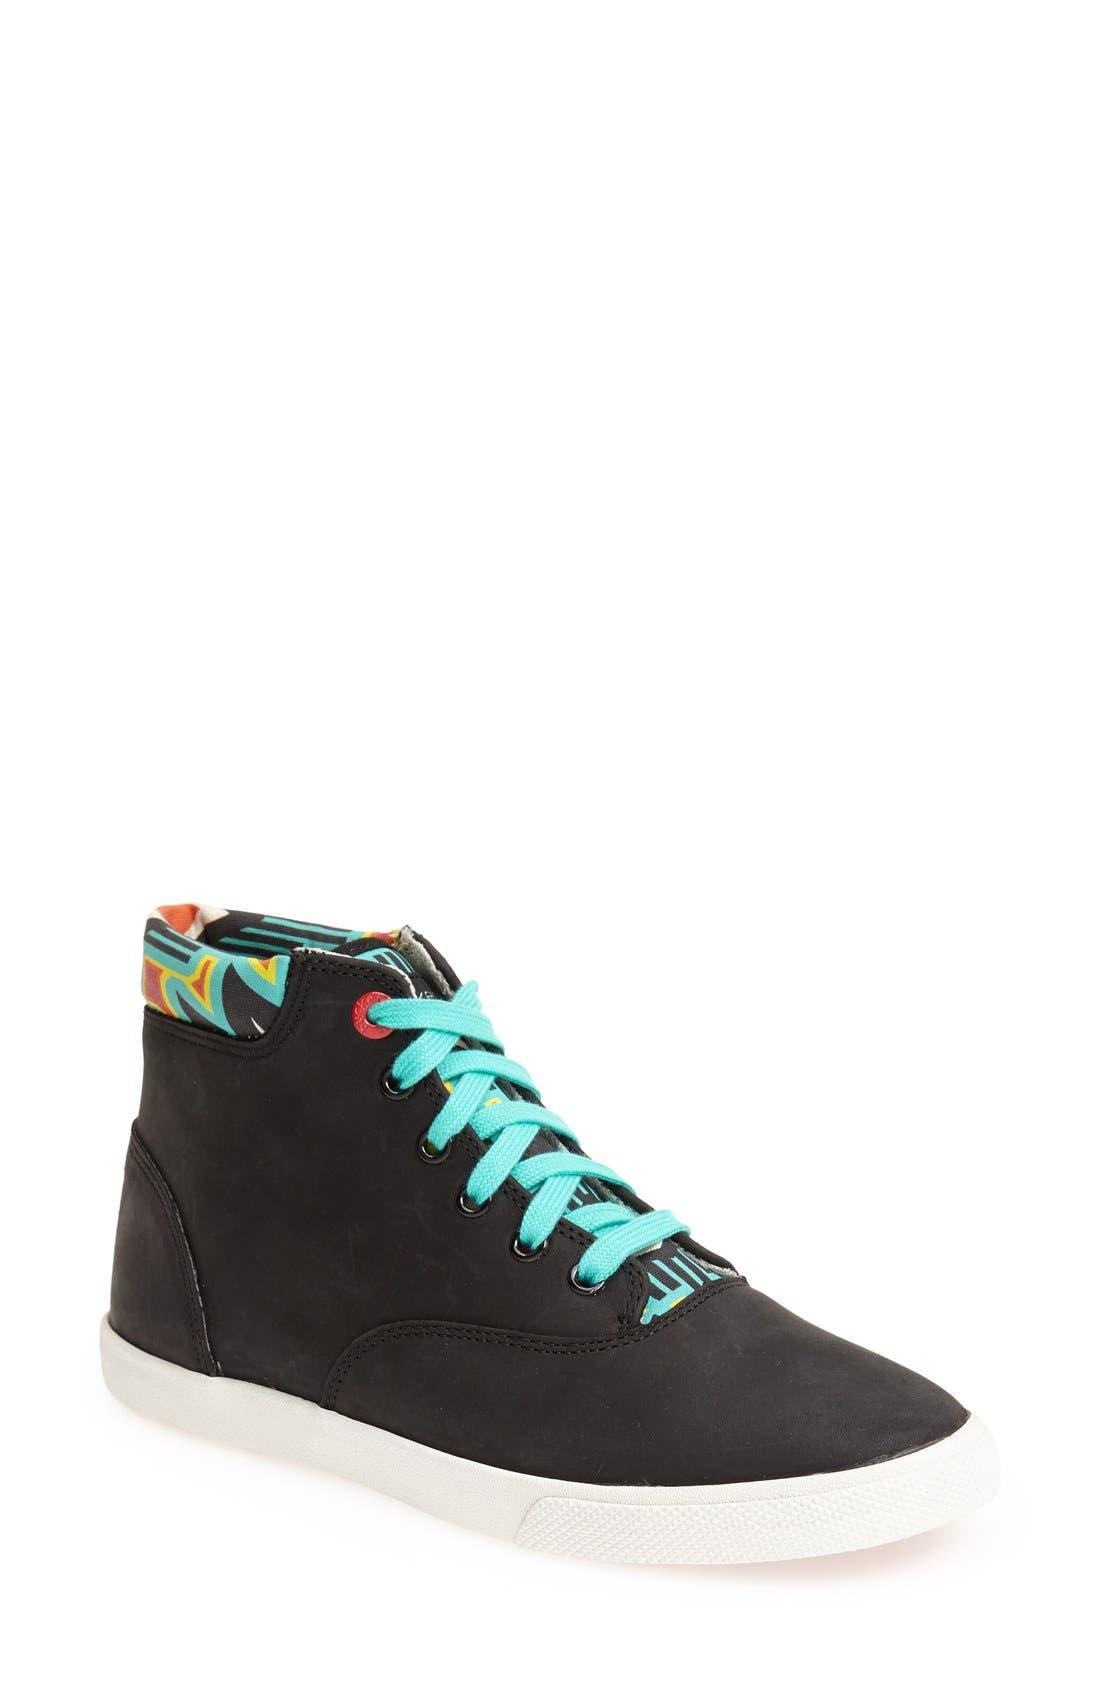 Main Image - BucketFeet 'Archer B' Mid Top Leather Sneaker (Women)